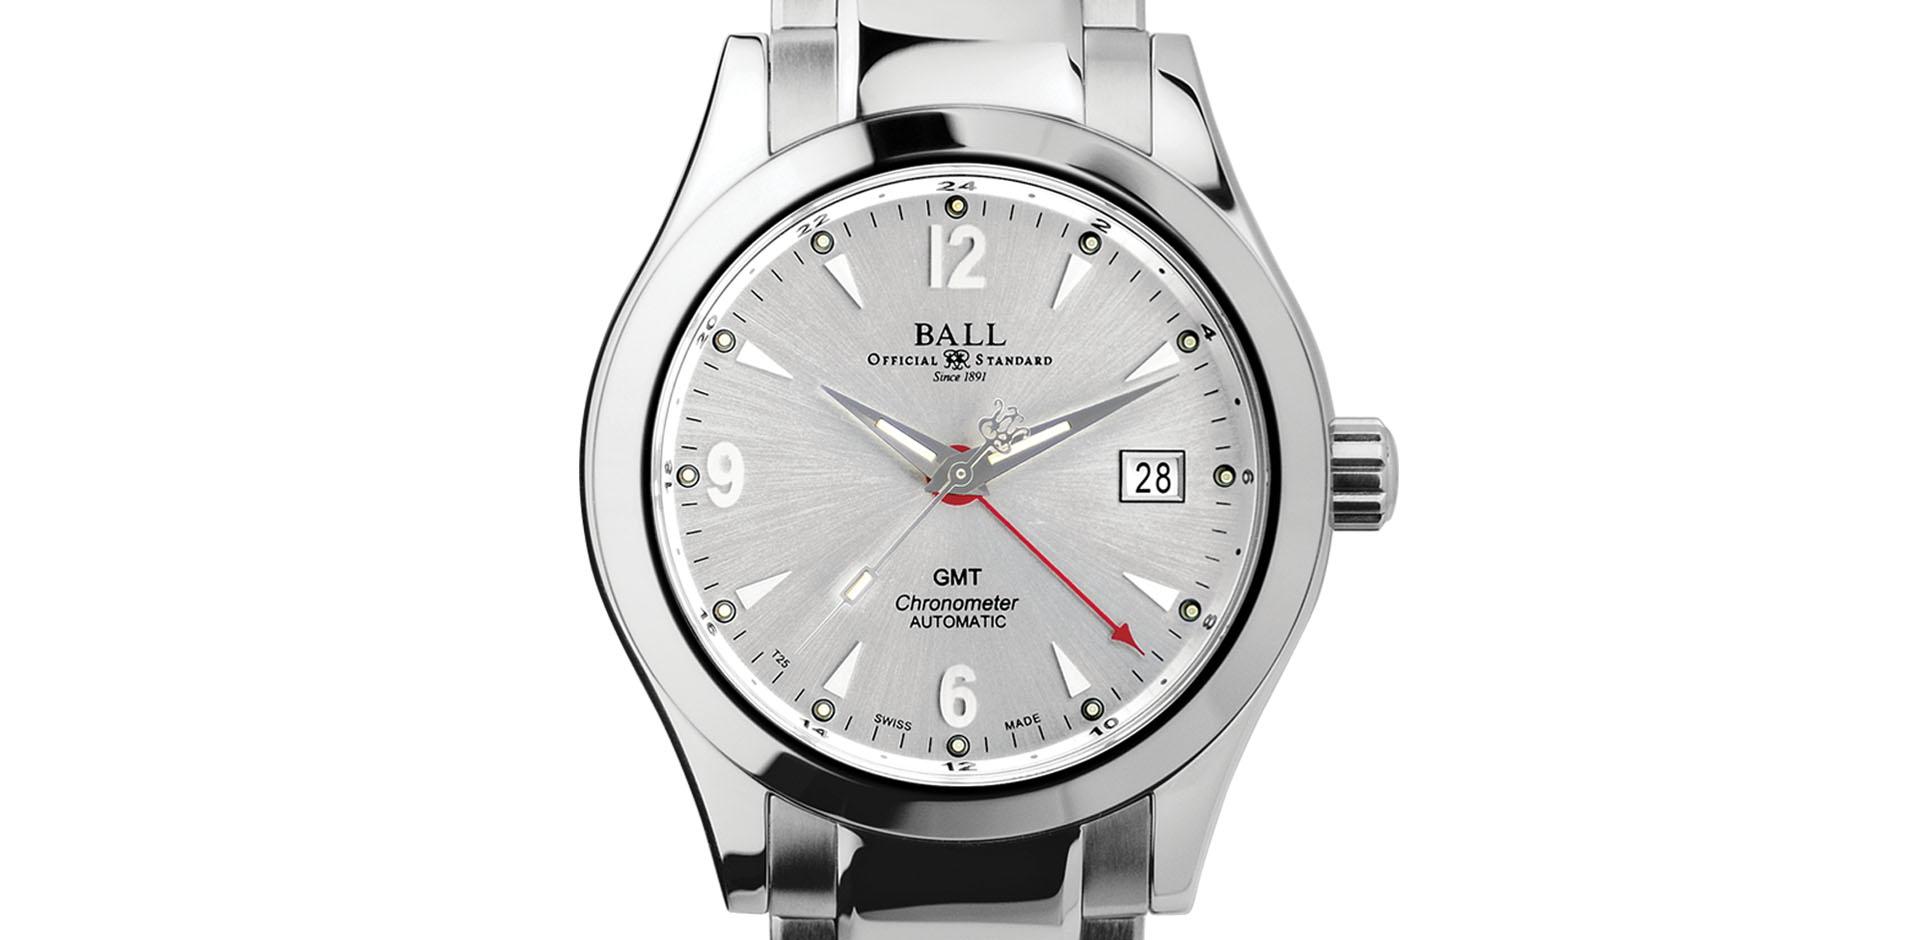 ball watch chronometer